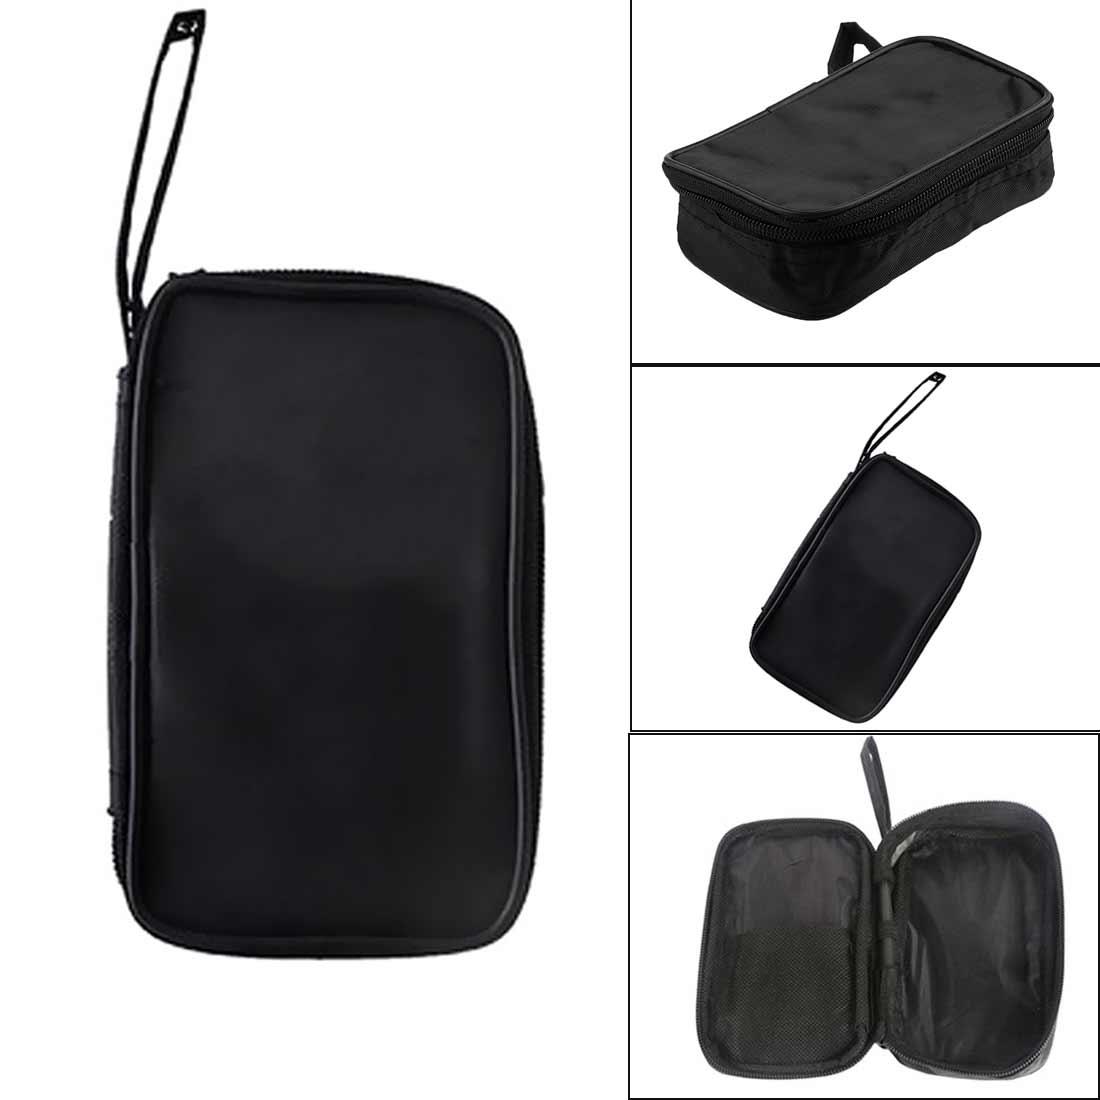 Black Waterproof Shockproof Soft Case 23x14x5cm Multimeter Colth Bag Durable Tool Bag